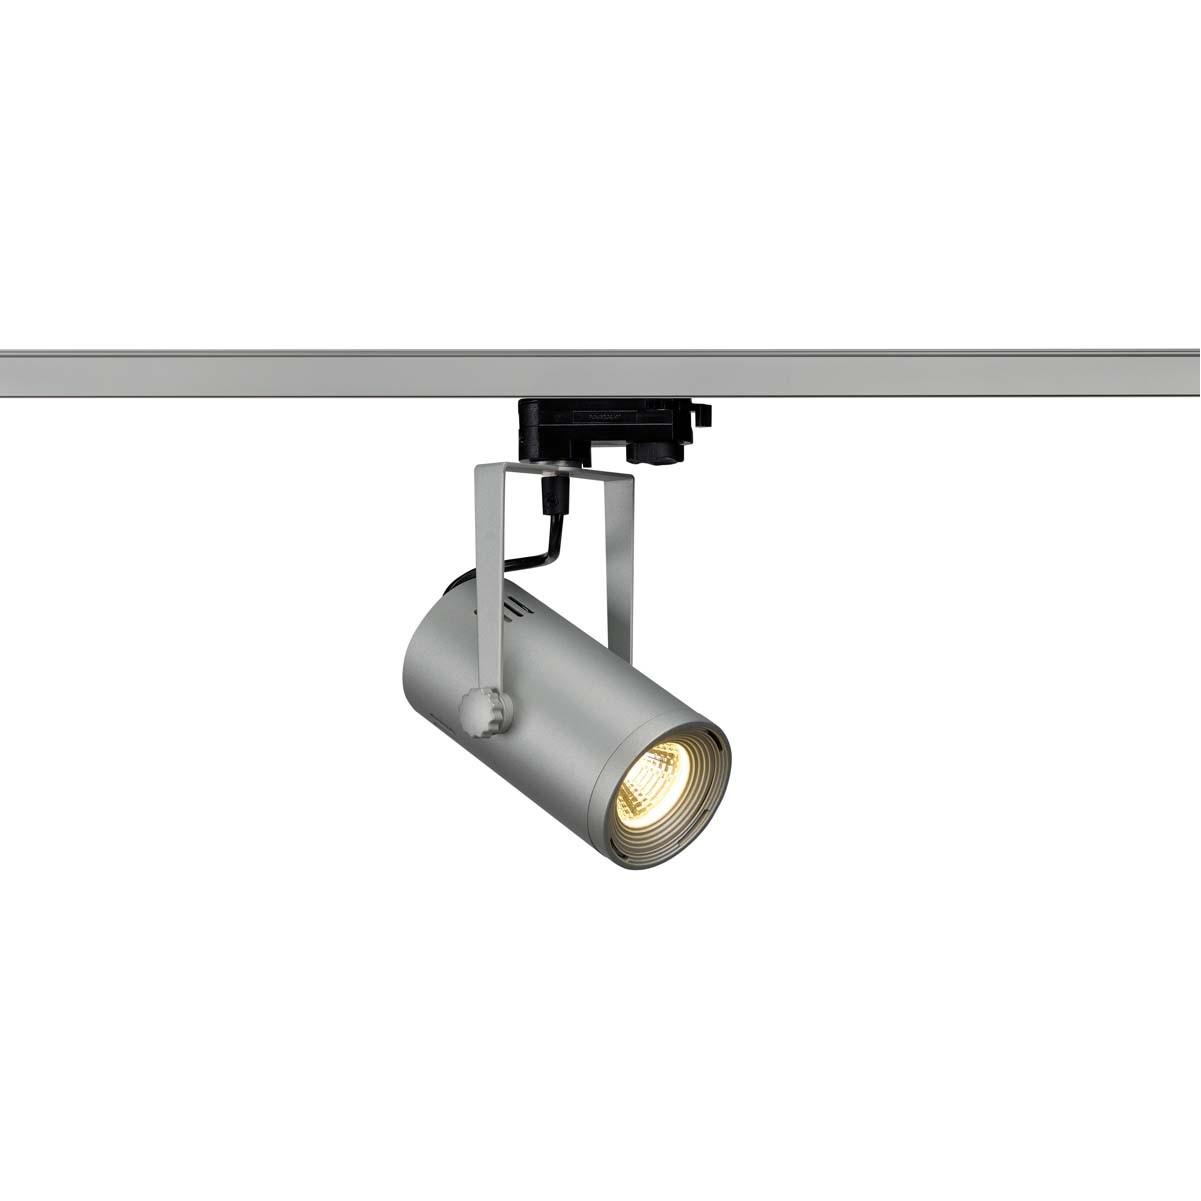 SLV 153804 Euro Spot LED 9W 3000K Eutrac 3 Circuit Track Light Silver Grey